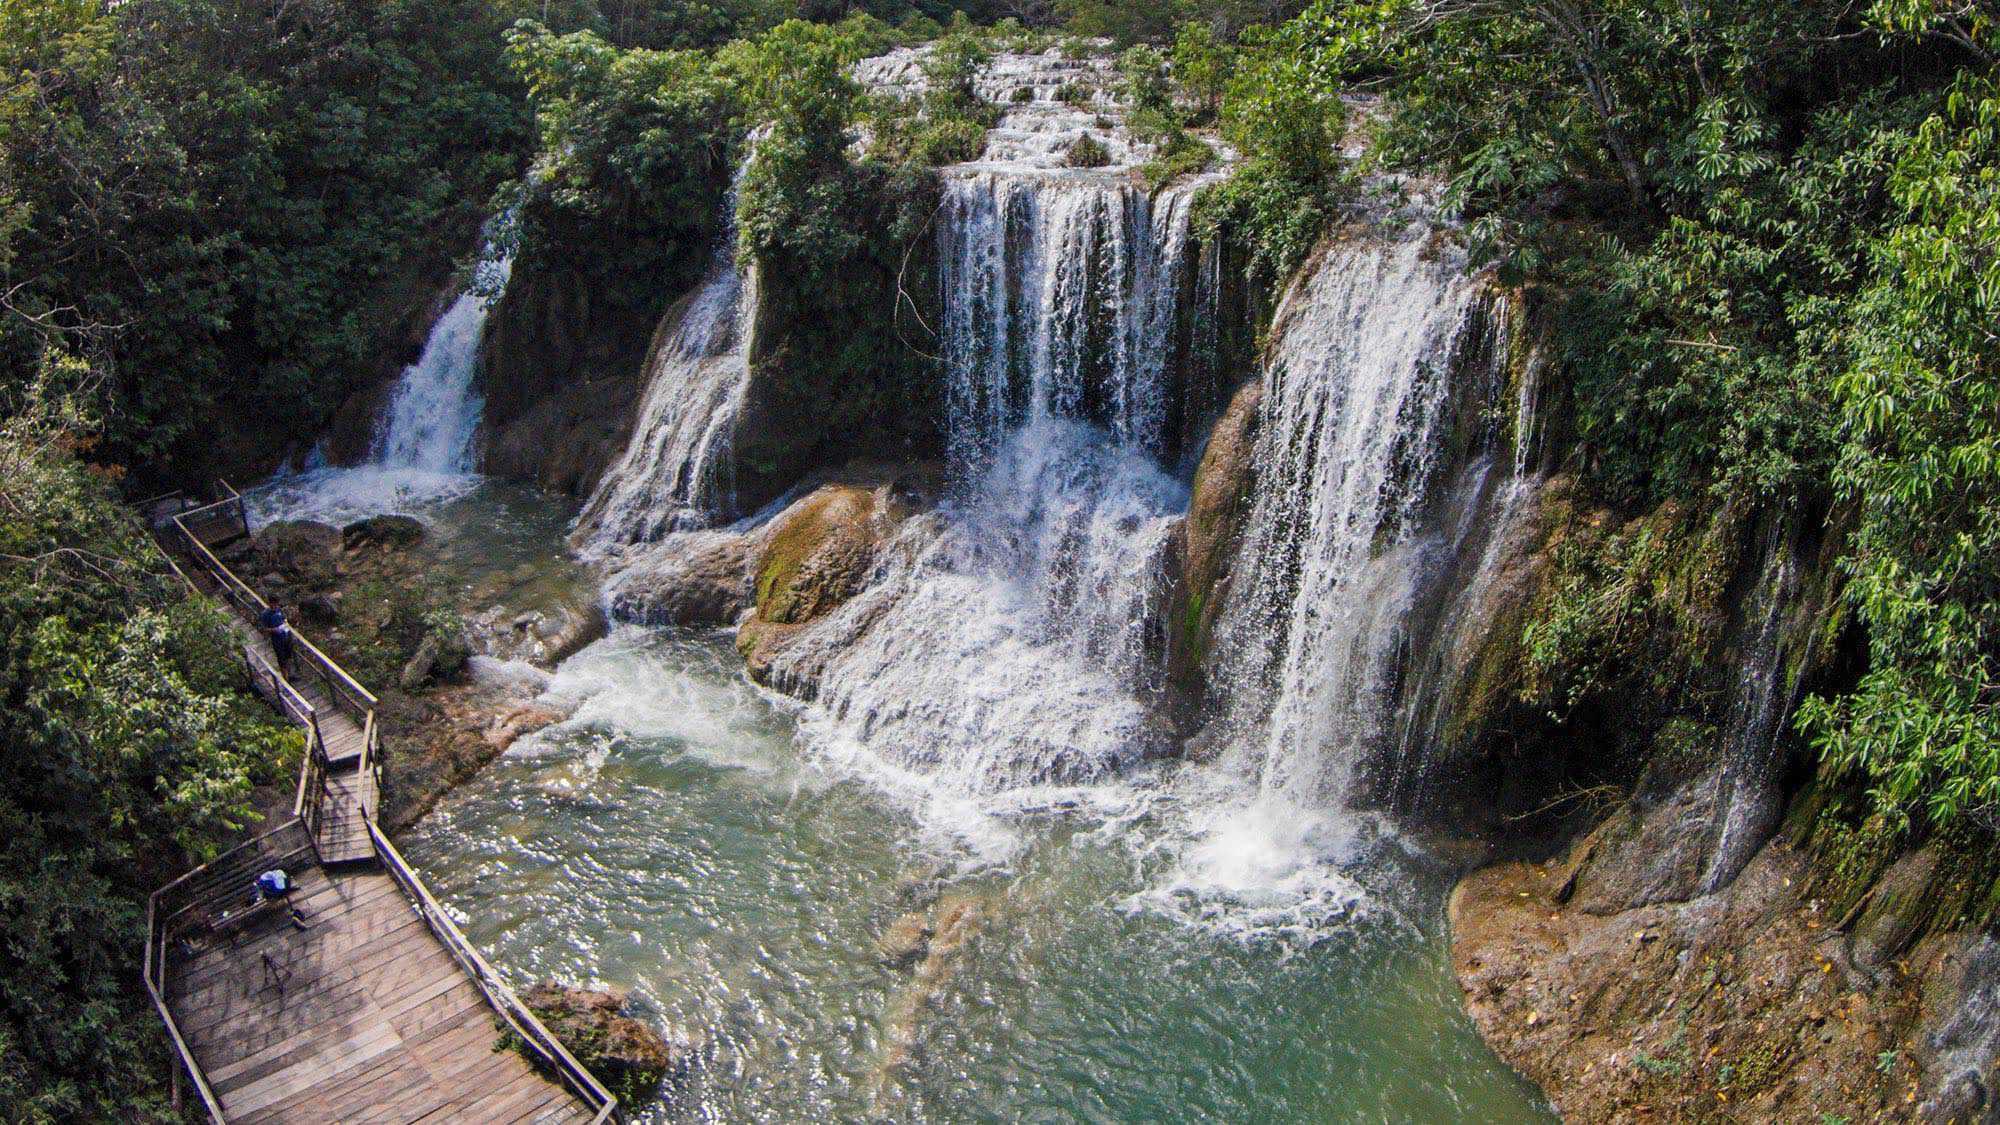 Cachoeira - Parque das Cachoeiras